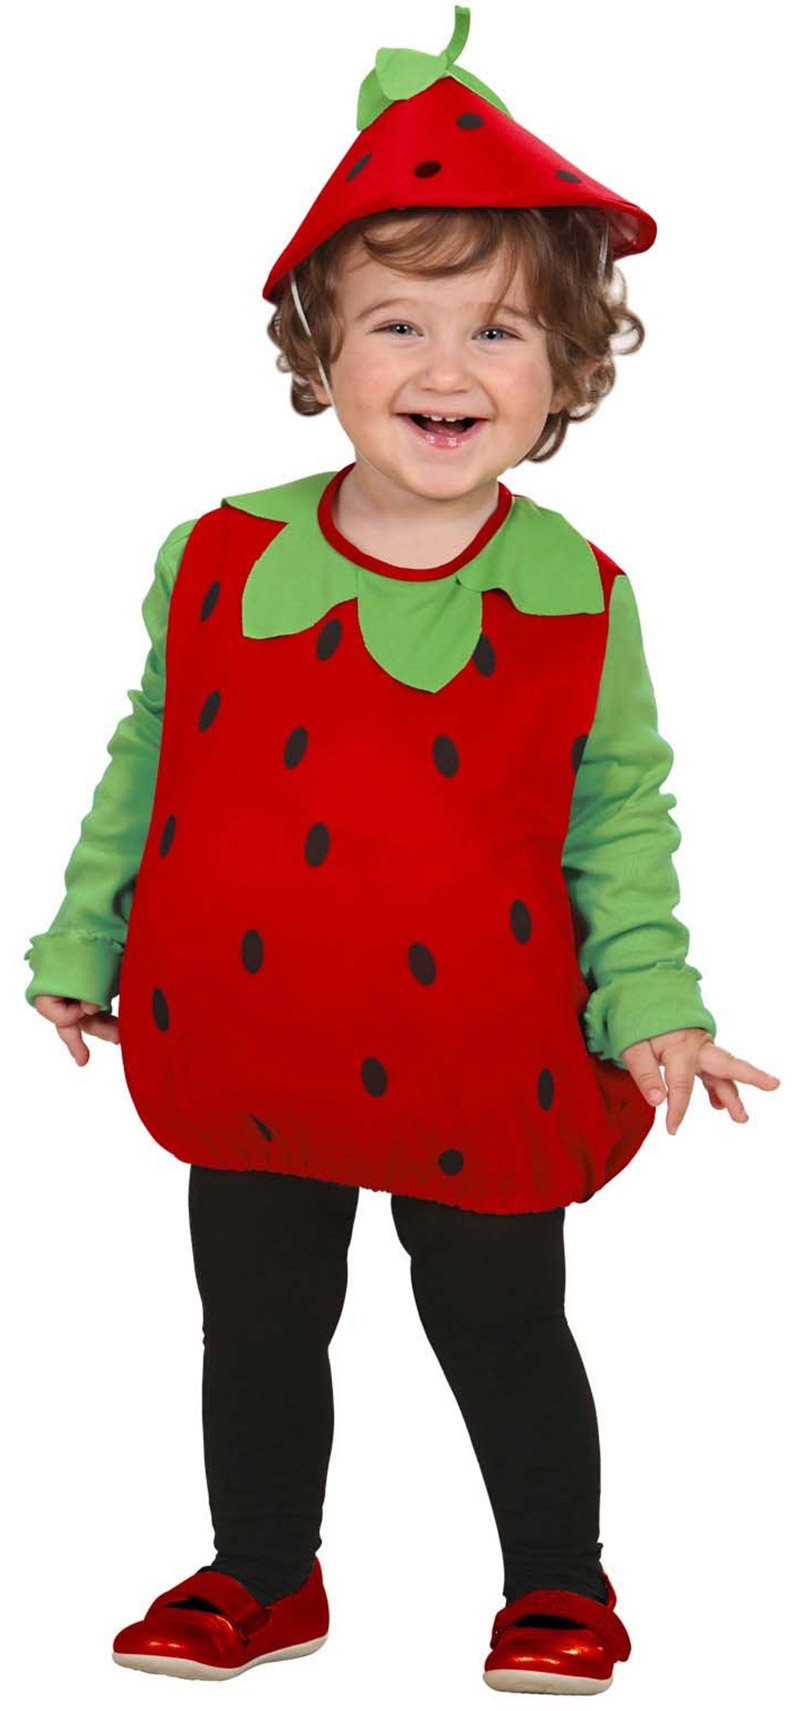 Disfraz para niños de Widmann, varios modelos